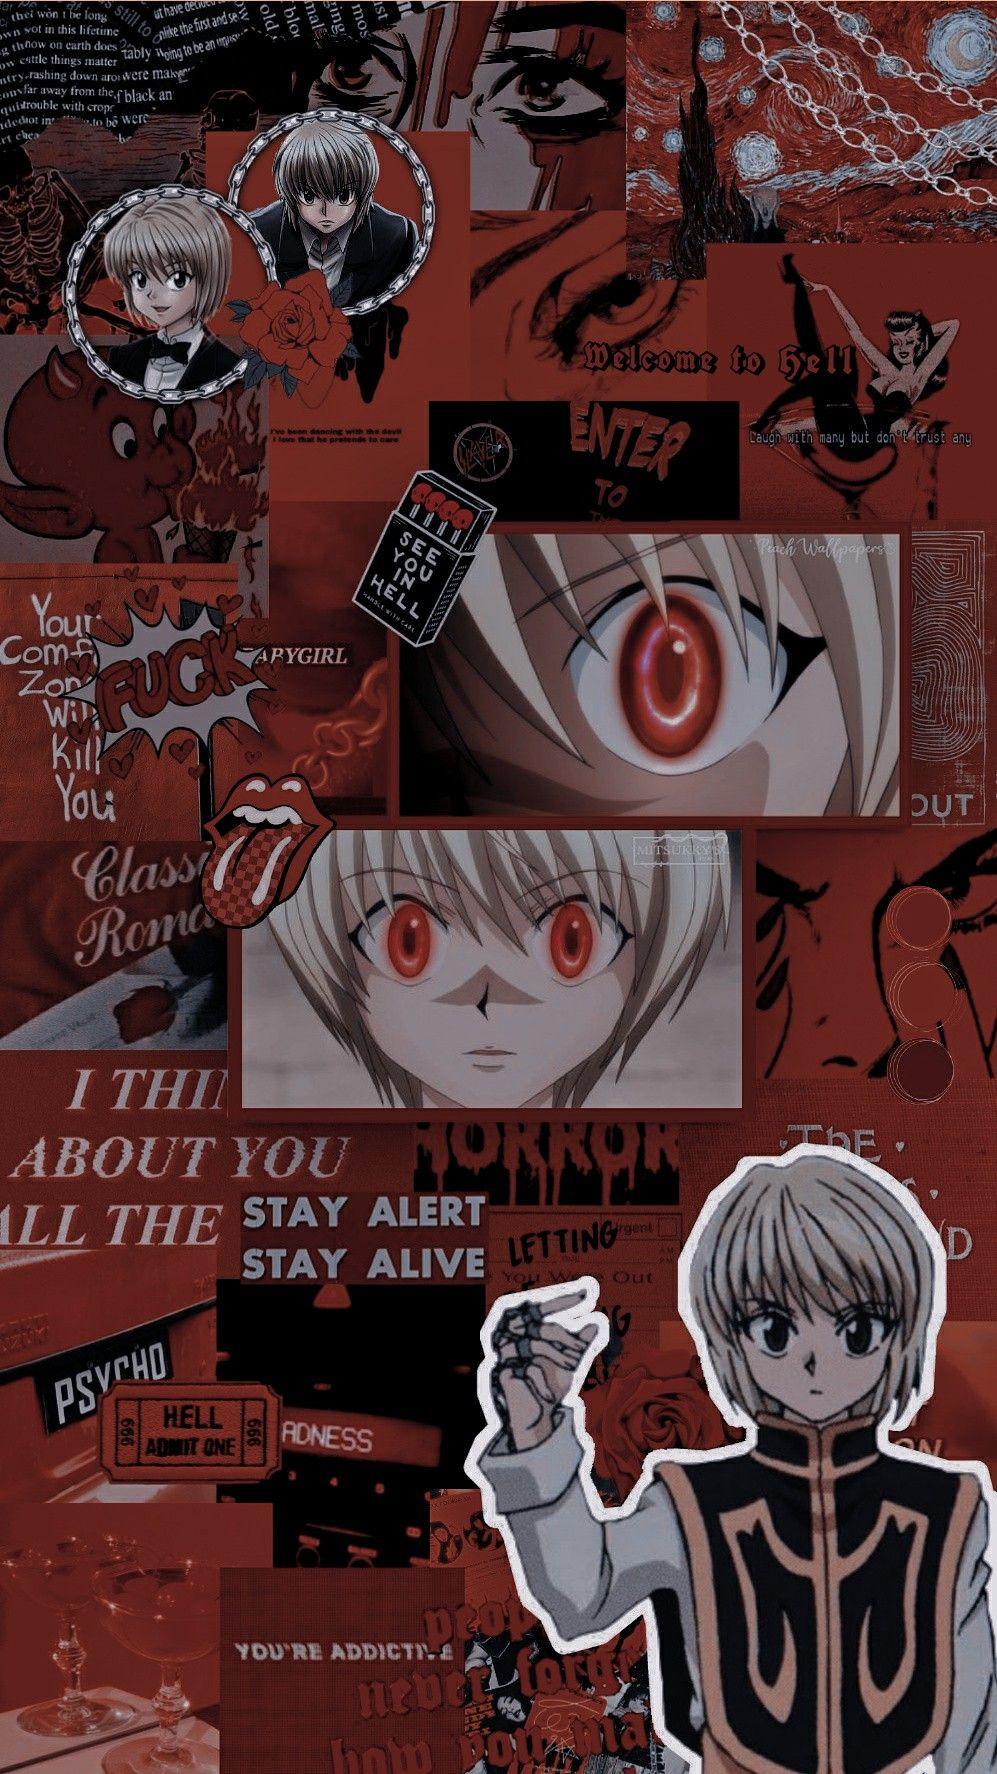 Kurapika Wallpaper Anime Artwork Wallpaper Anime Wallpaper Cute Anime Wallpaper